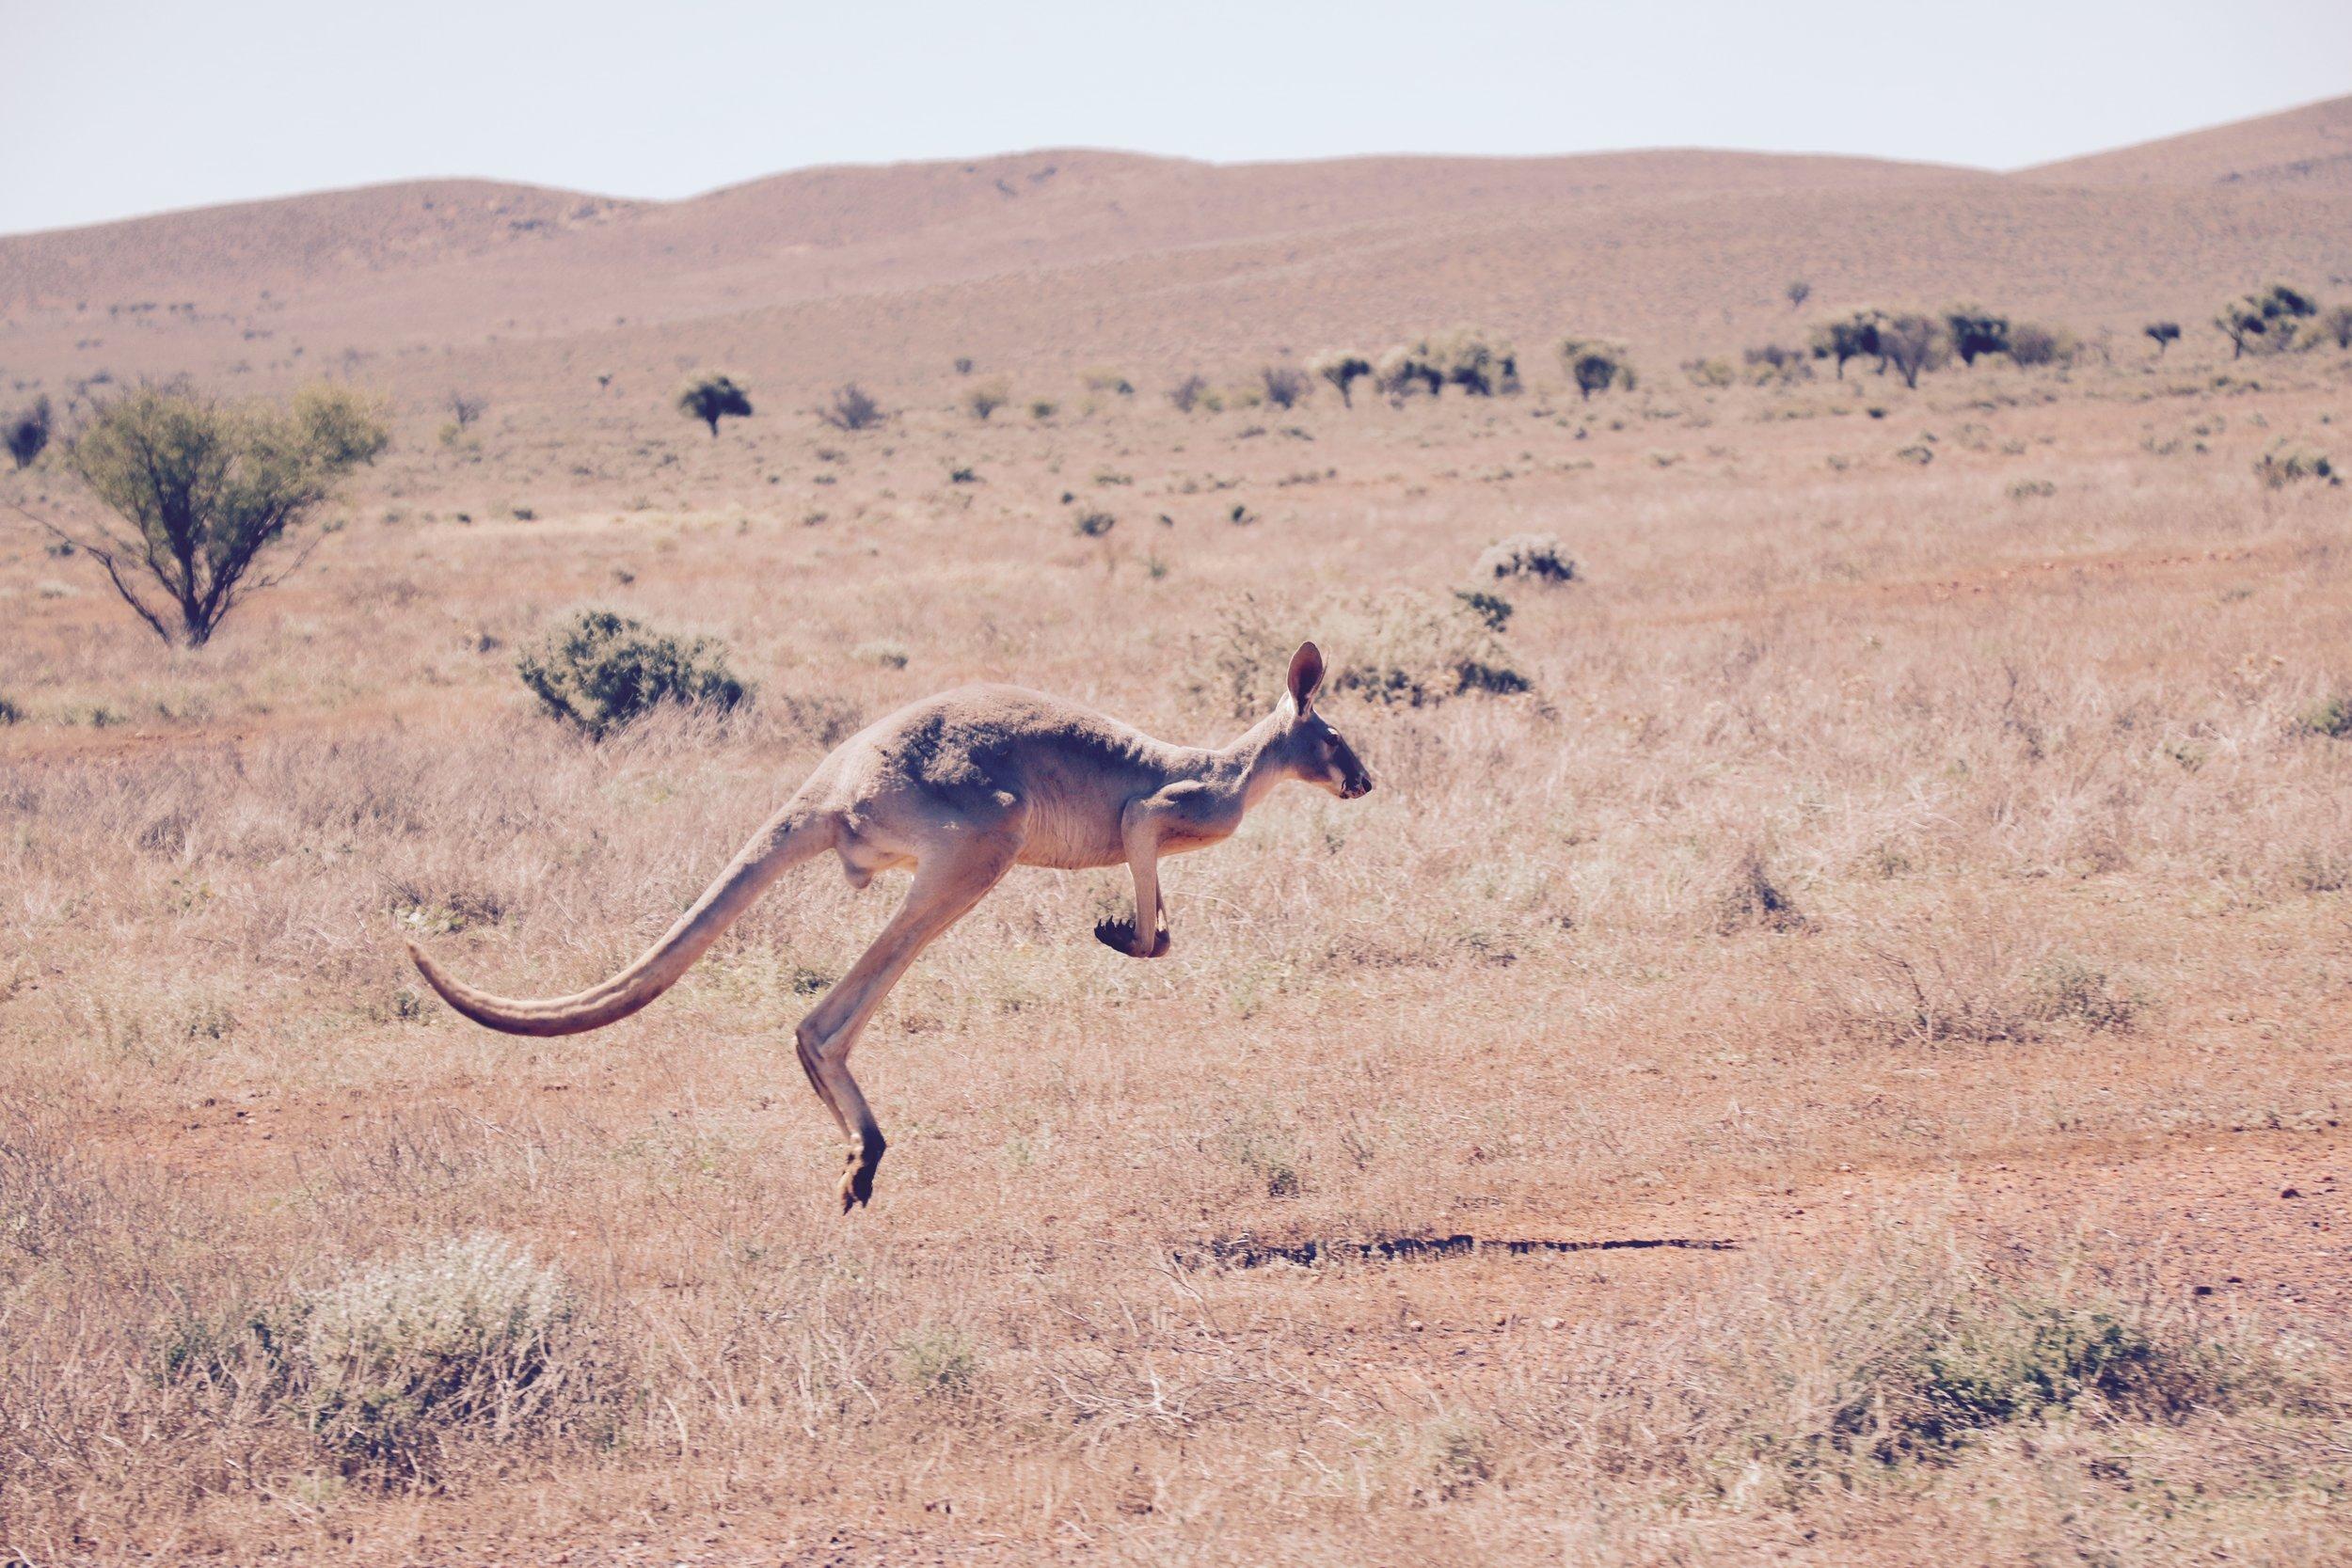 AUSTRALIAN LANDSCAPE - Bush, Outback, Flora & Fauna